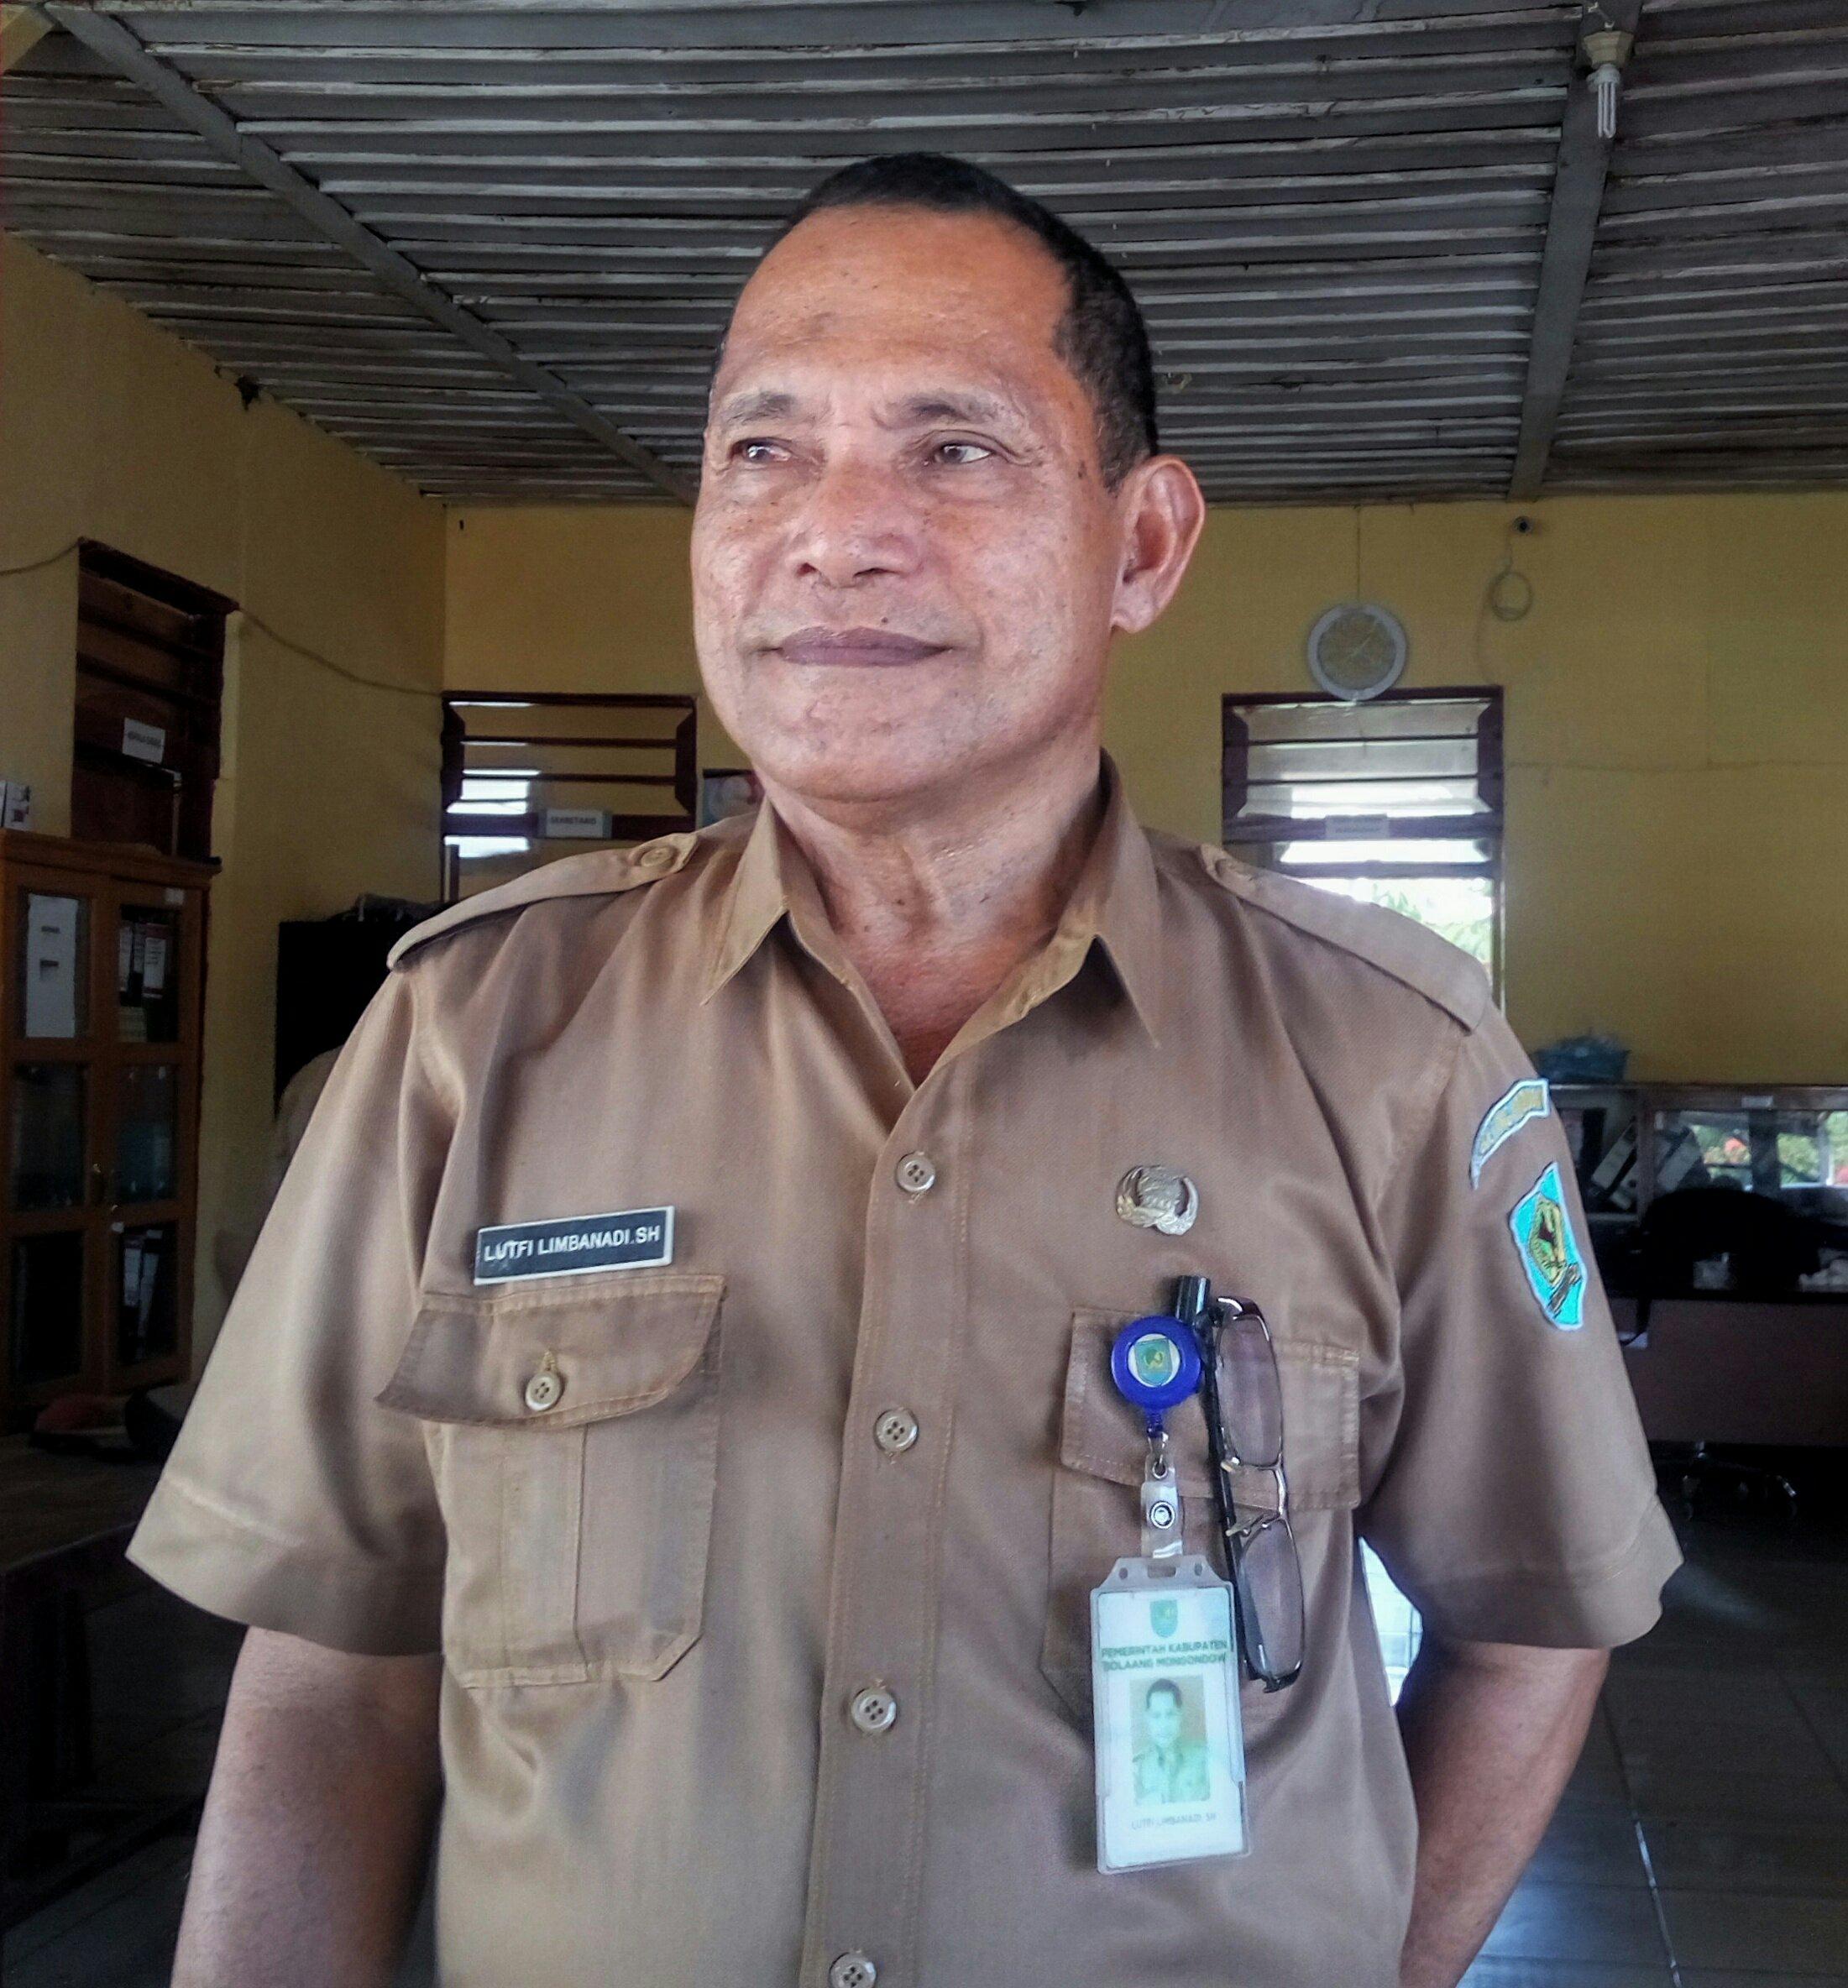 Atlet Bolmong Siap Rebut Medali di Porprov Sulut